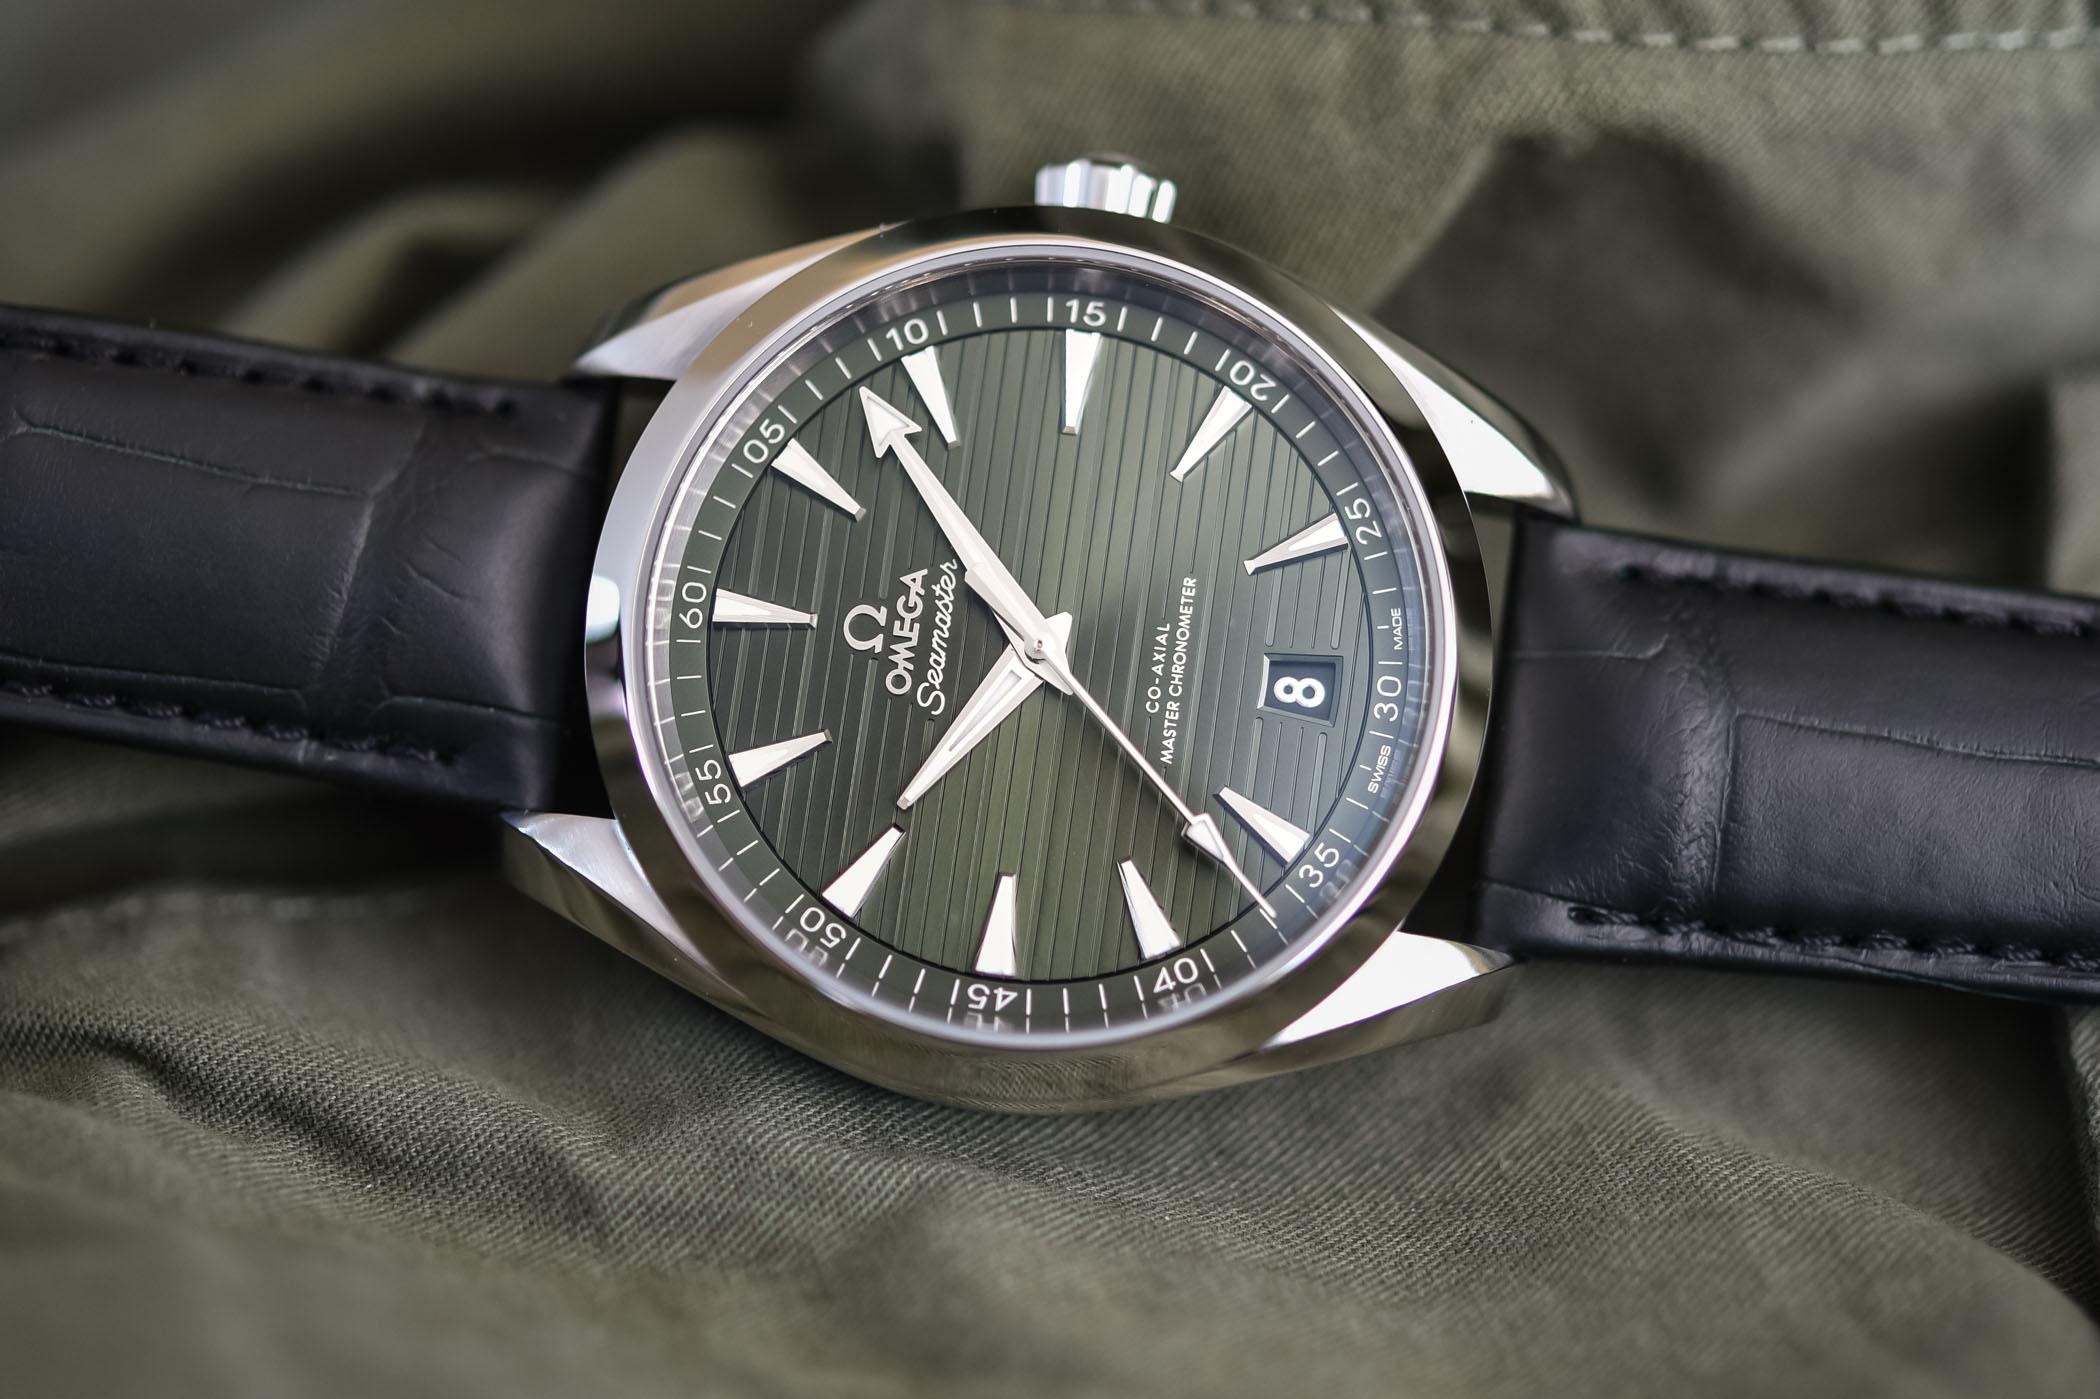 El Omega Seamaster Aqua Terra 150M Master Chronometer con correa de aligátor